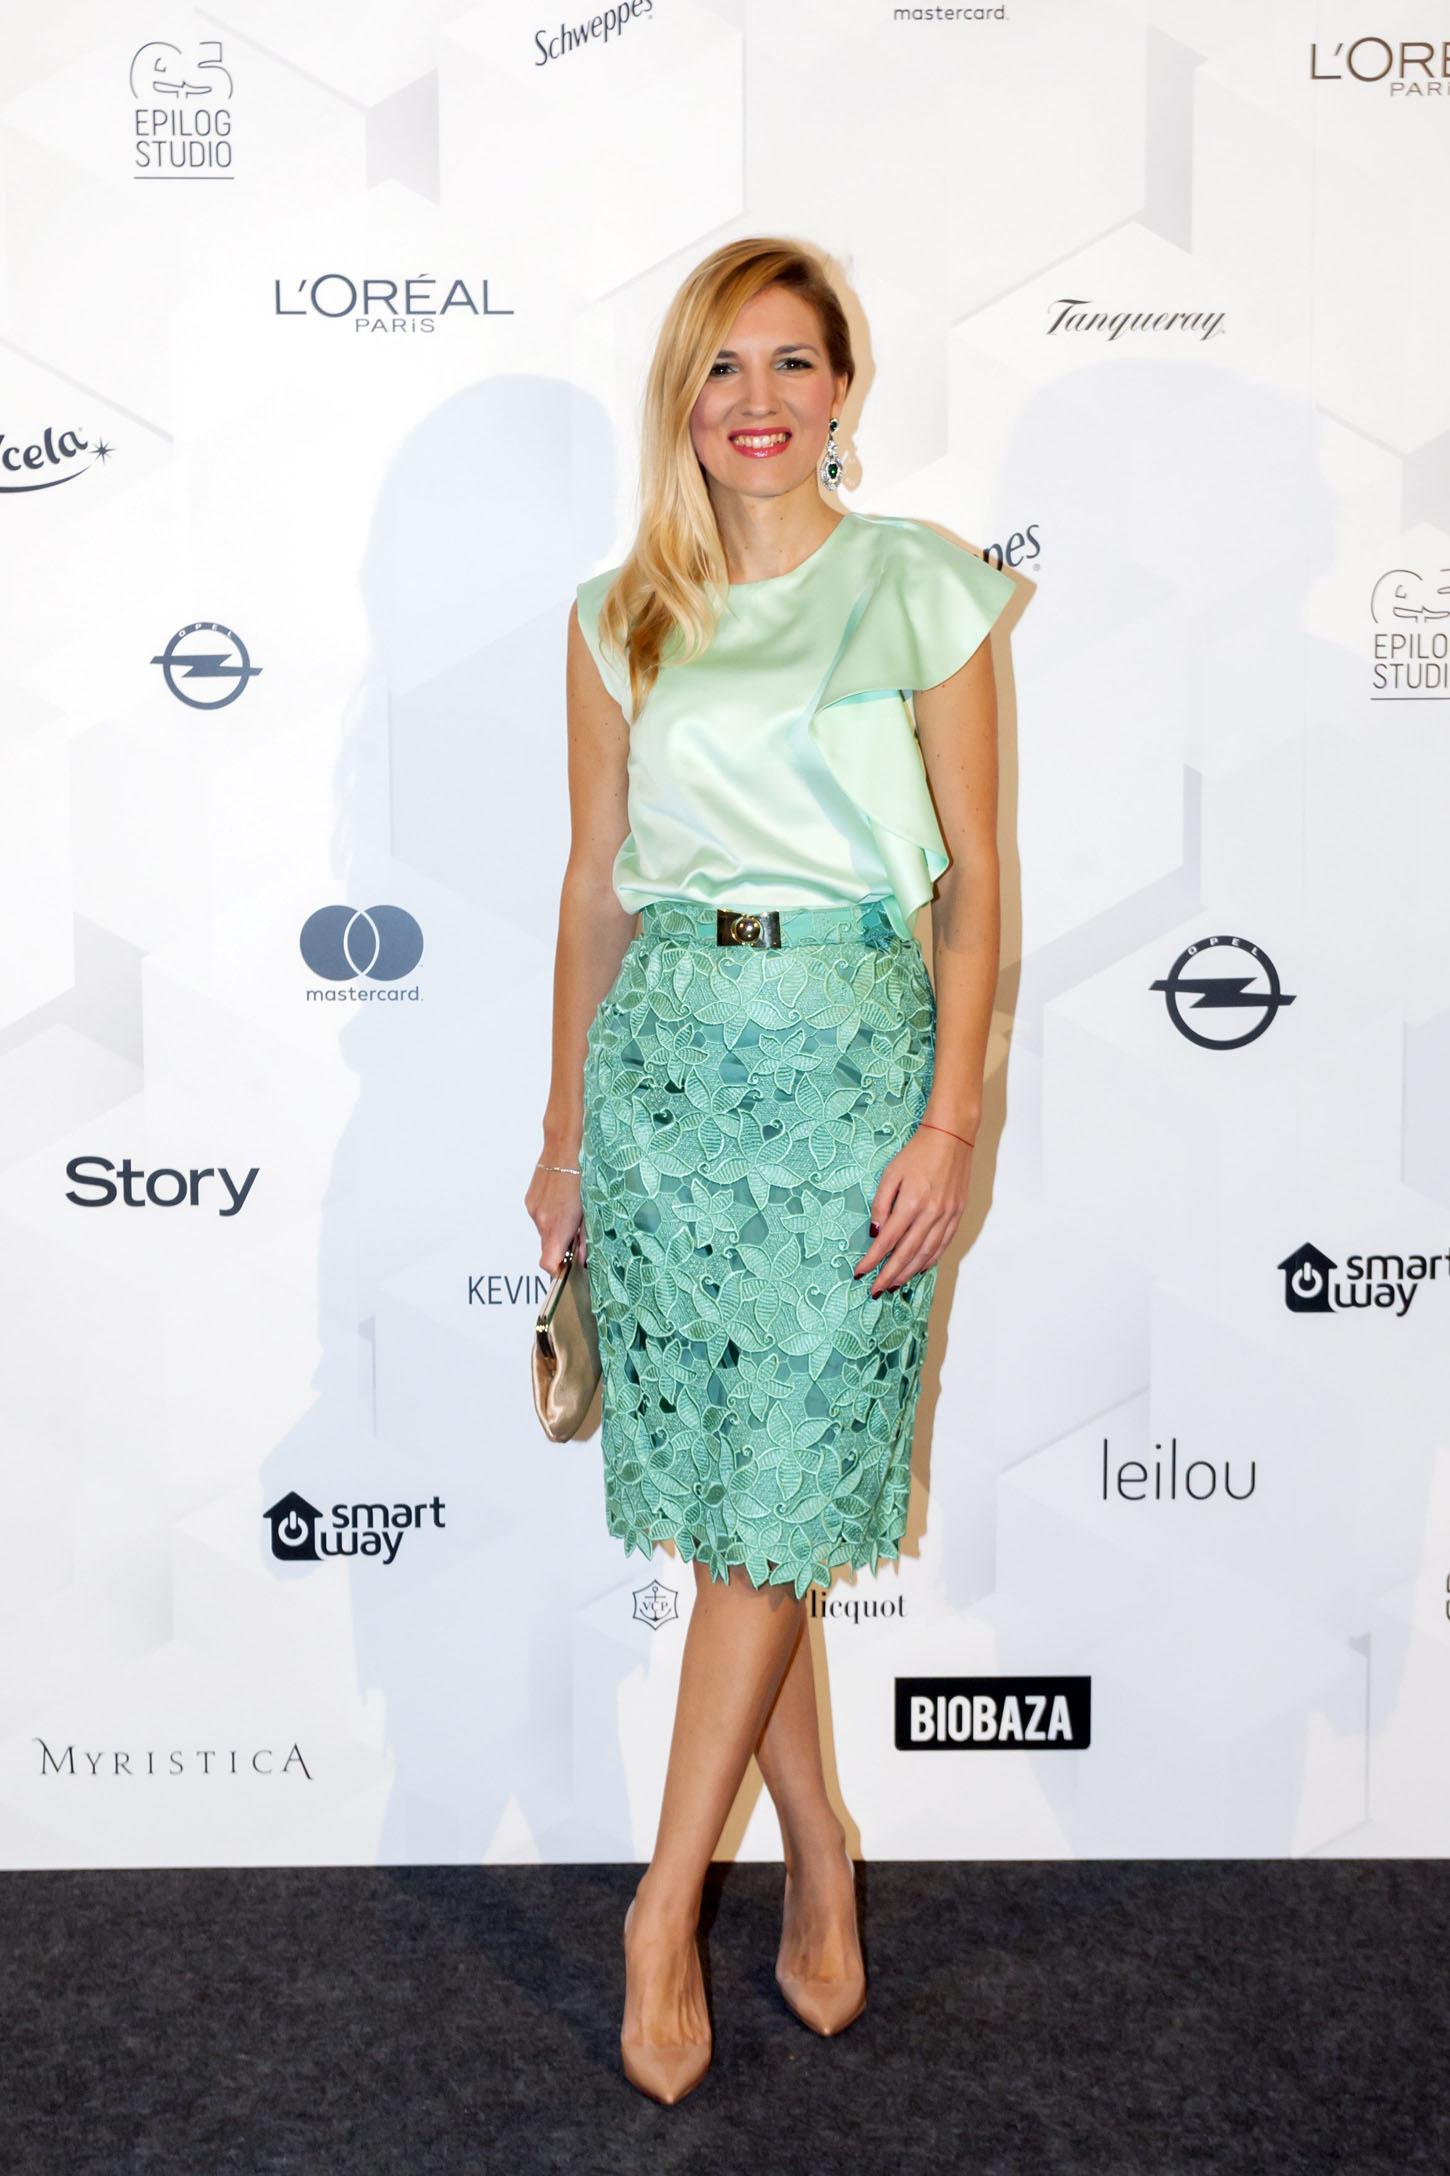 Zagreb, 201118. Prisavlje, Kockica. Poznati na modnoj reviji Aleksandre Dojcinovic. Na fotografiji: Irena Skoric. Foto: Tomislav Kristo / CROPIX